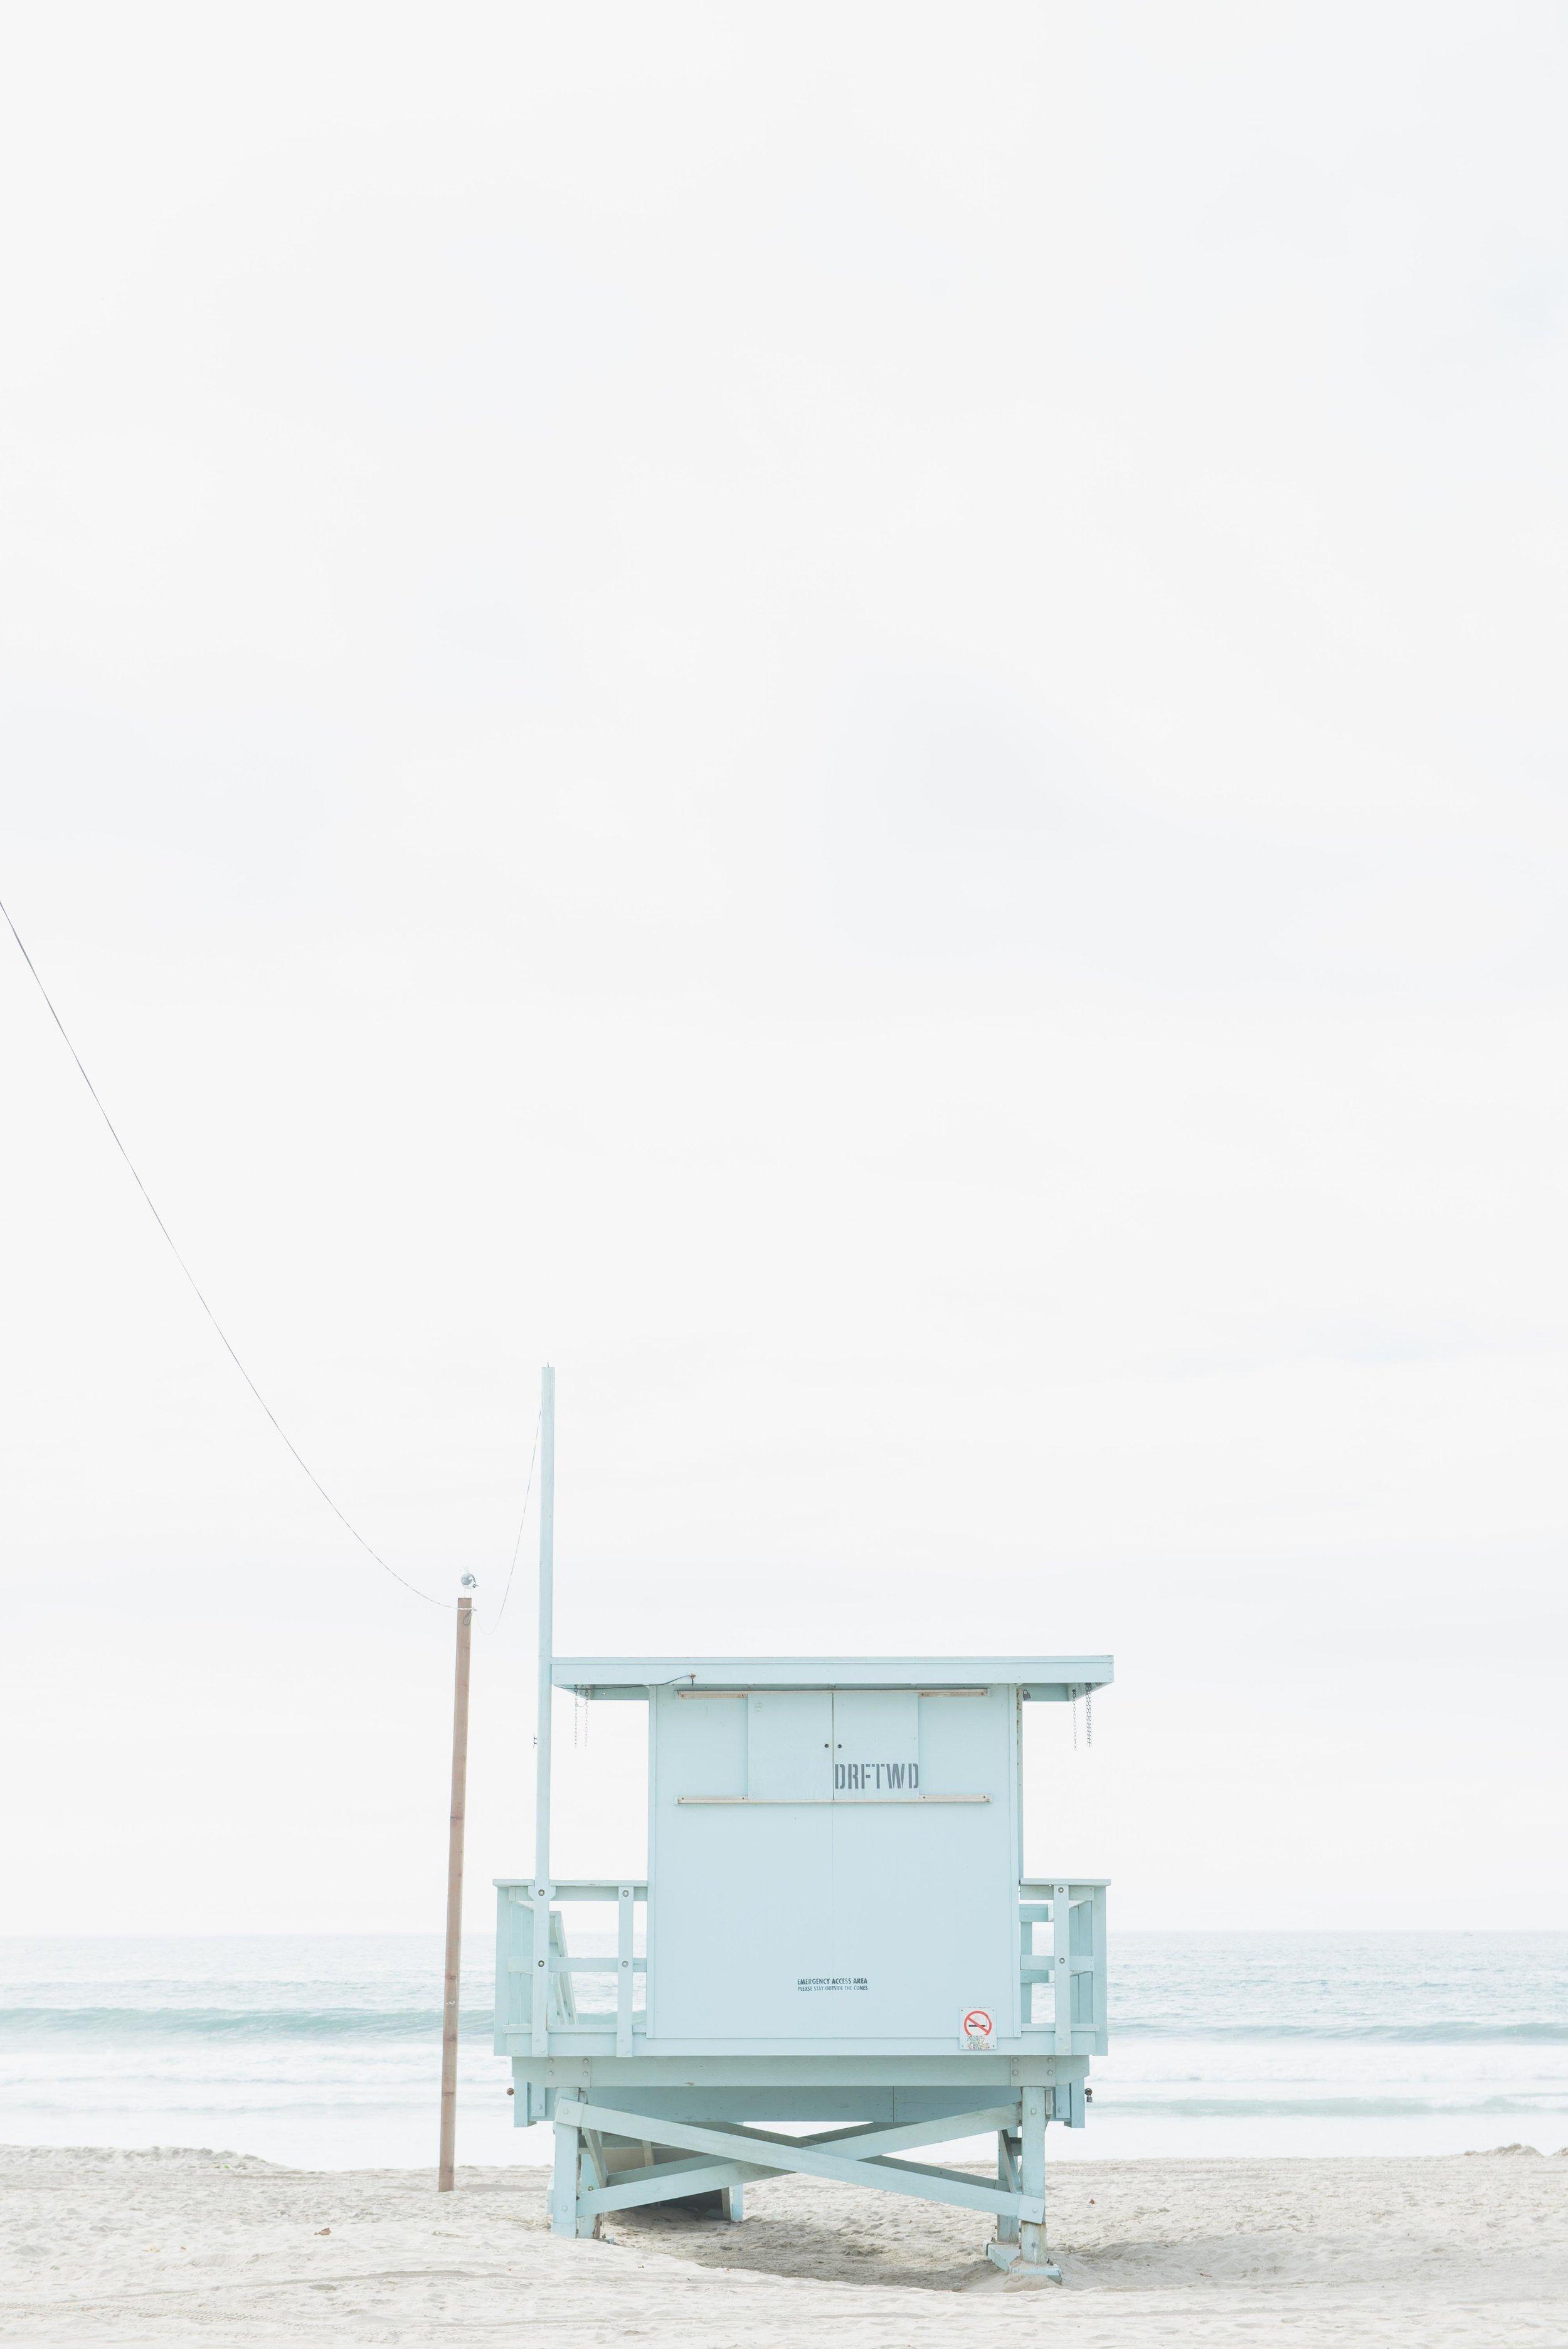 Carley Rudd Photography Guide to LA, Venice and Santa Monica